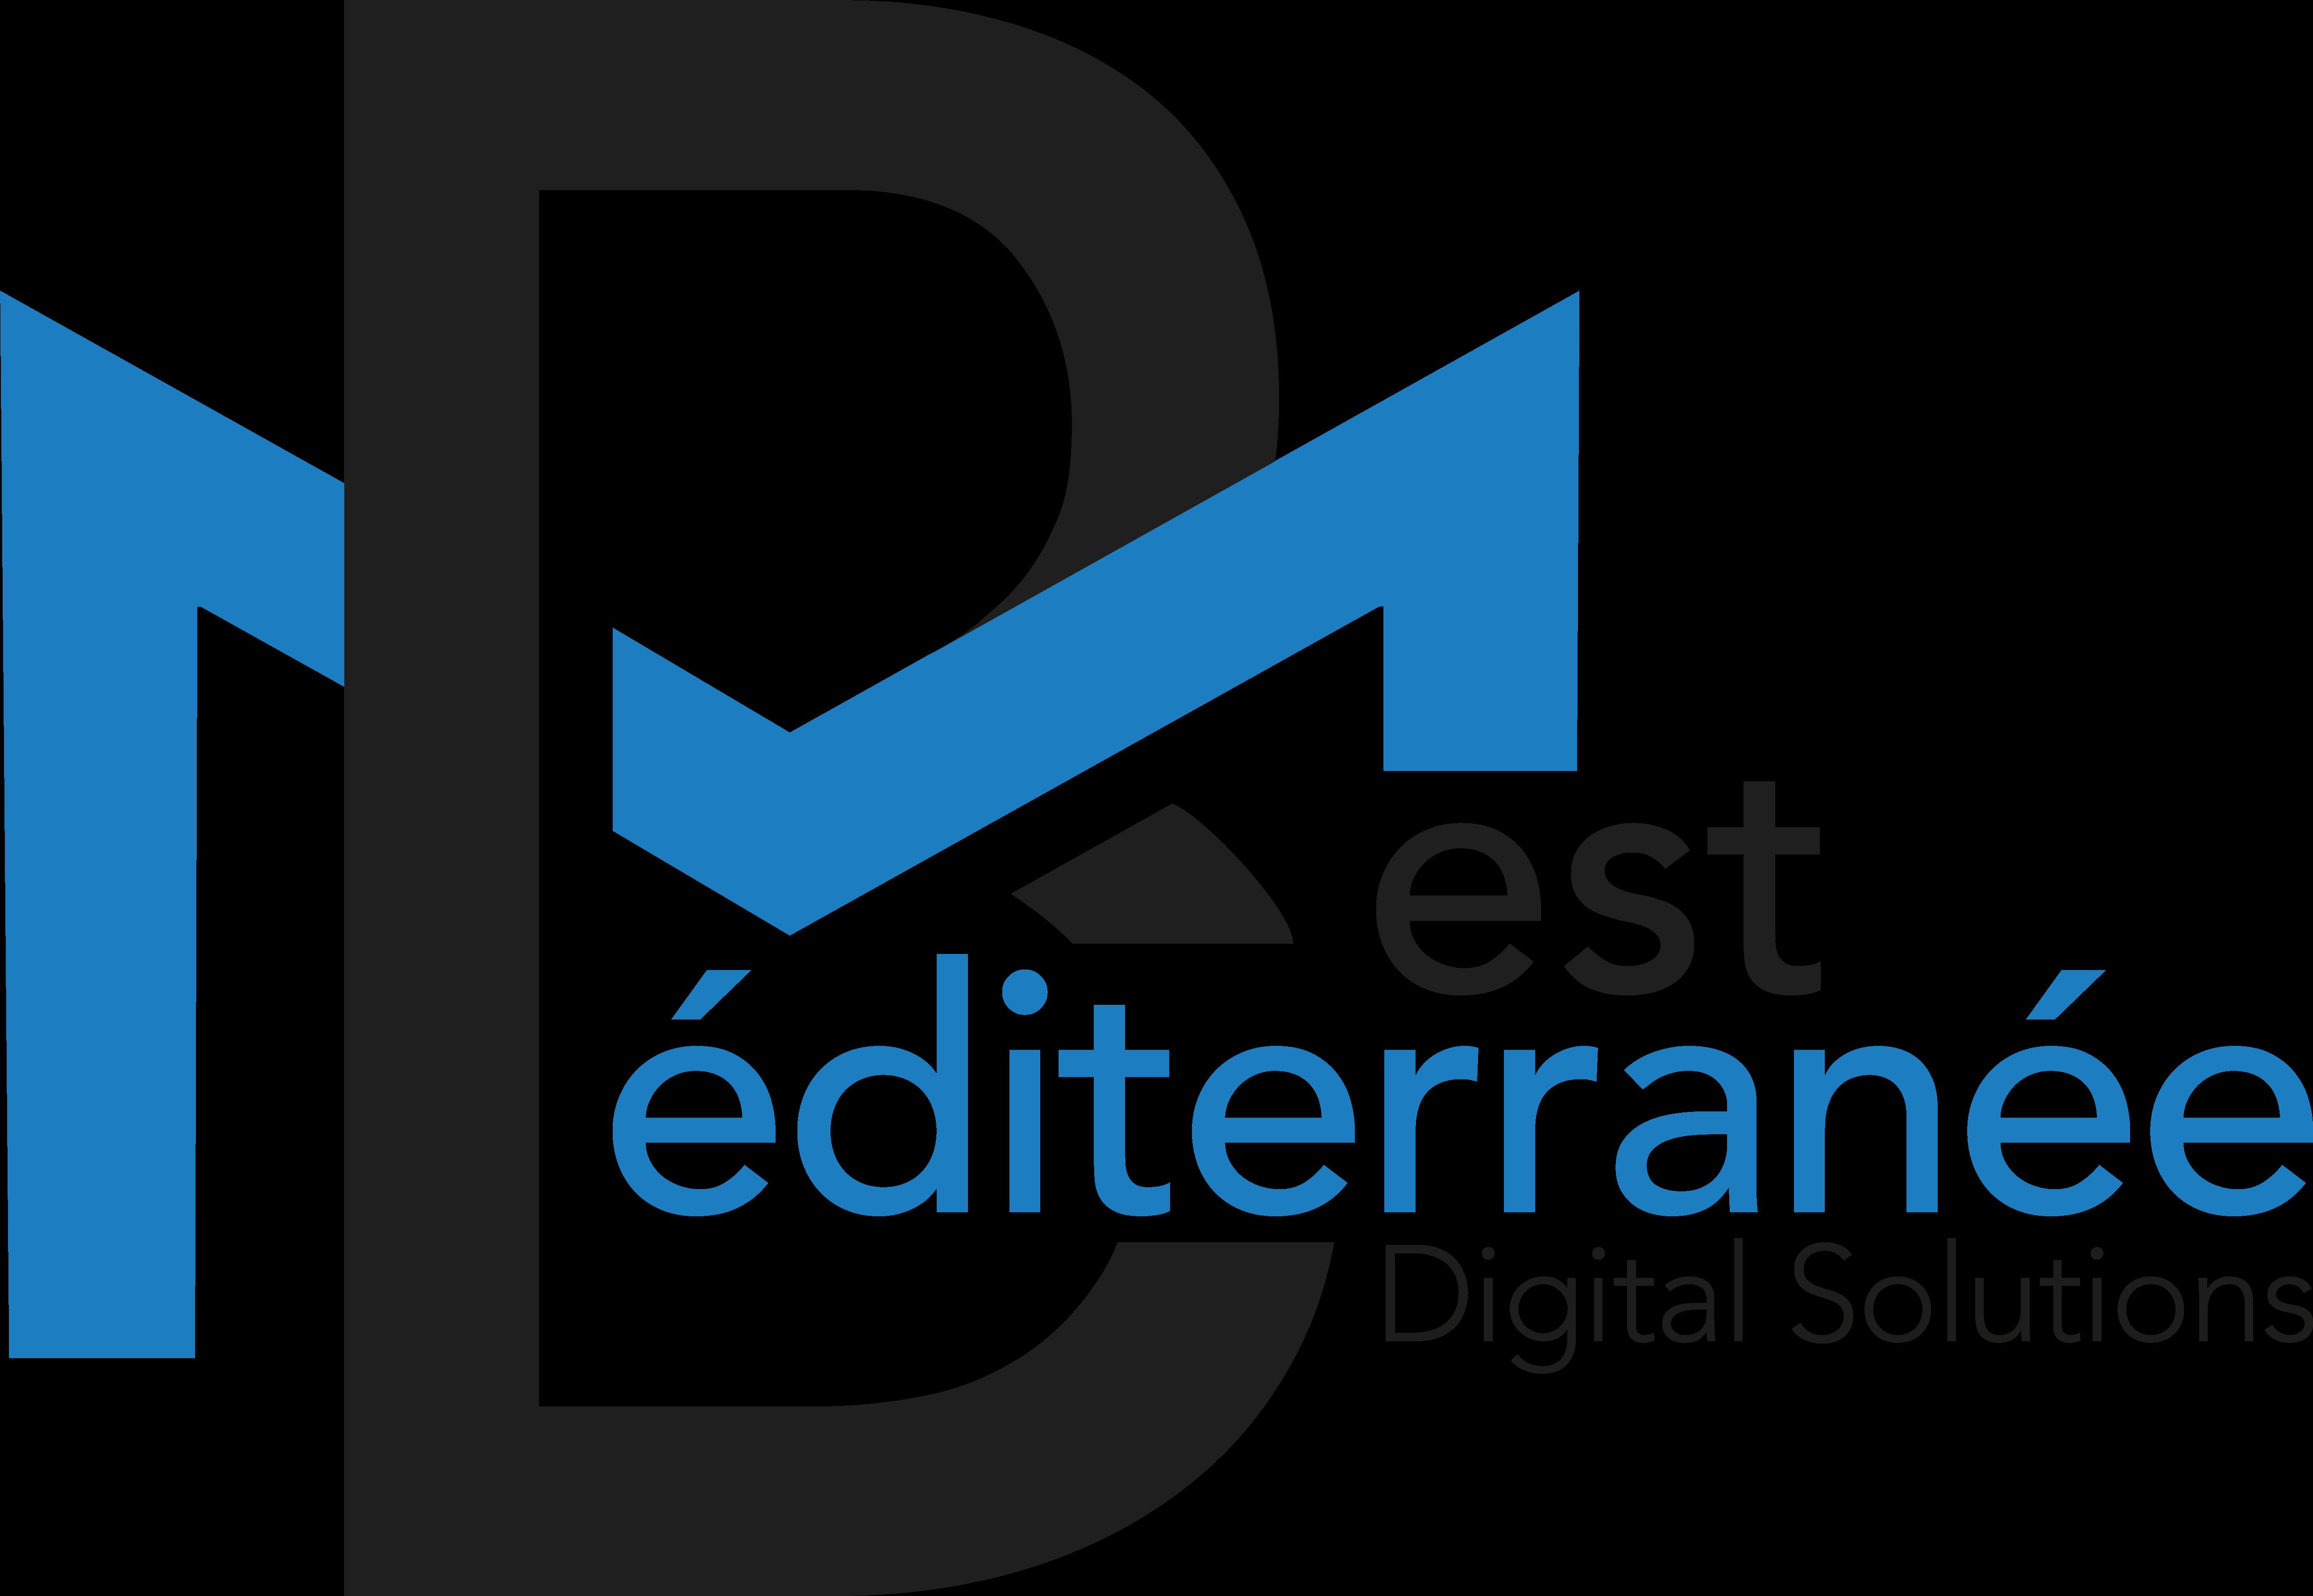 Contact Best Méditerrannée